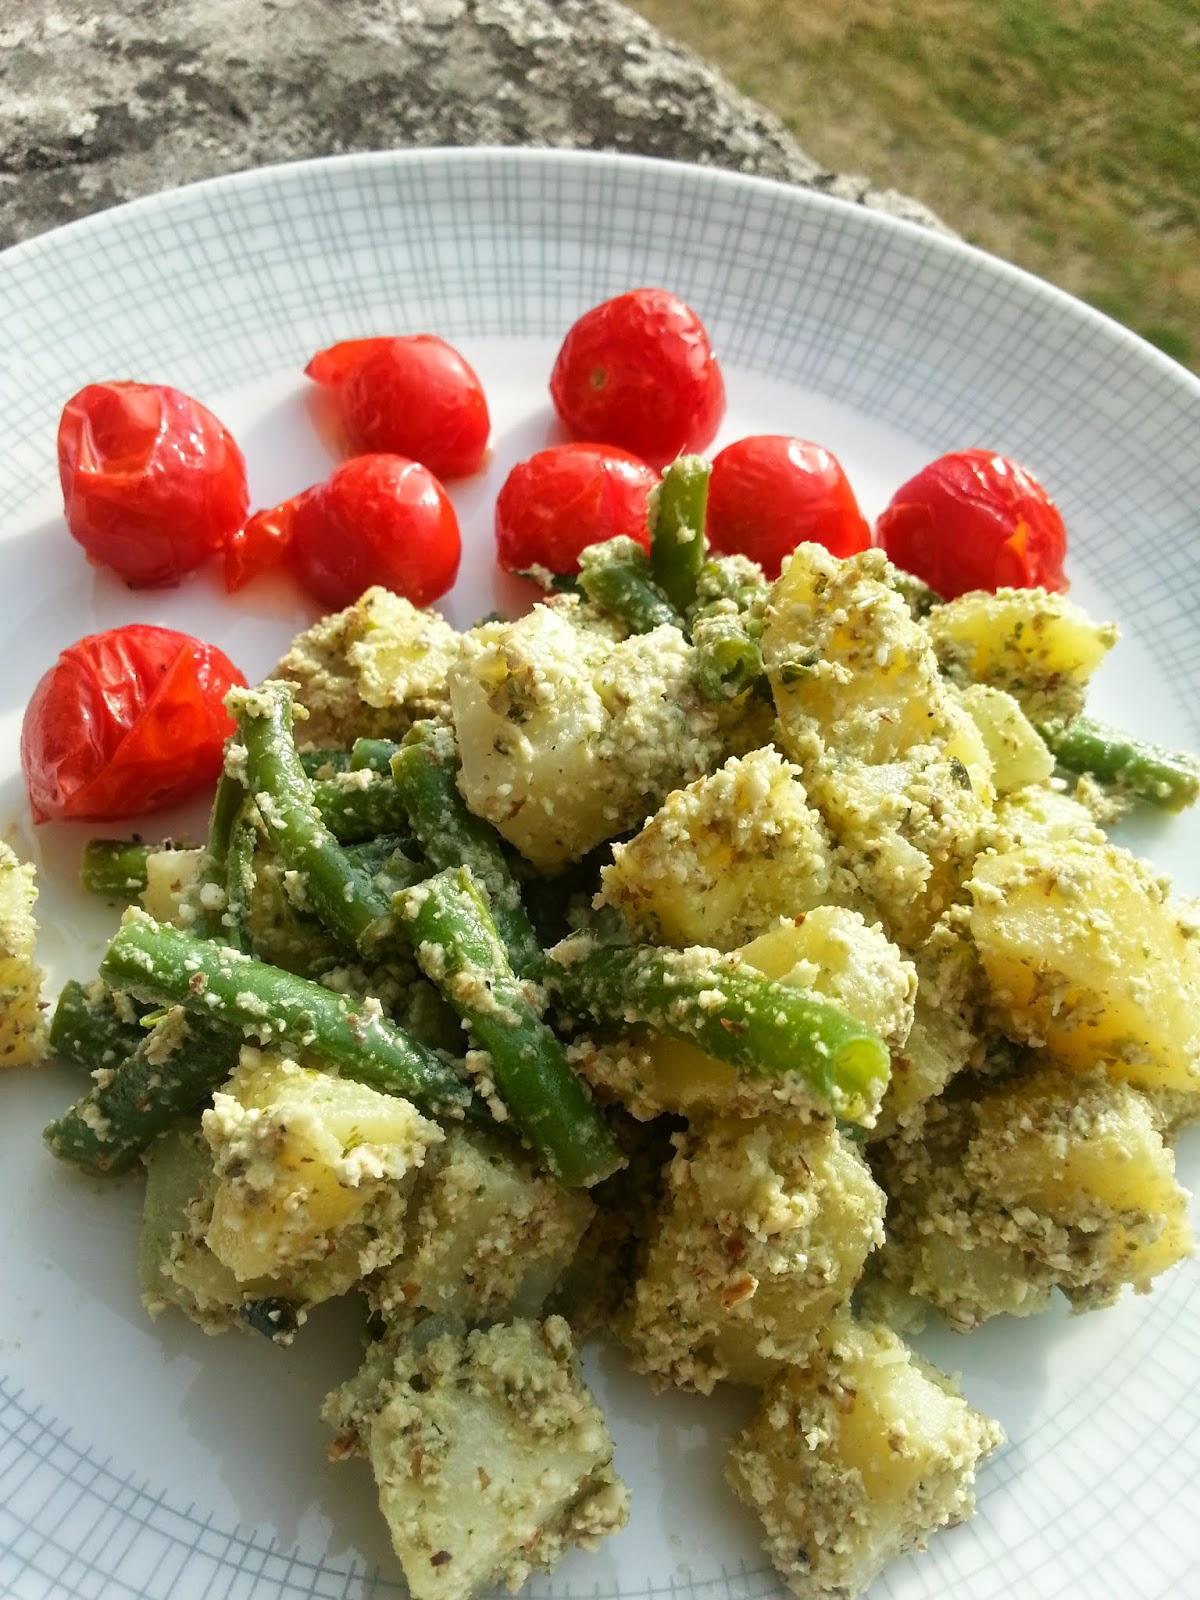 Aardappel-sperziebonen salade met hazelnoten-basilicumdressing